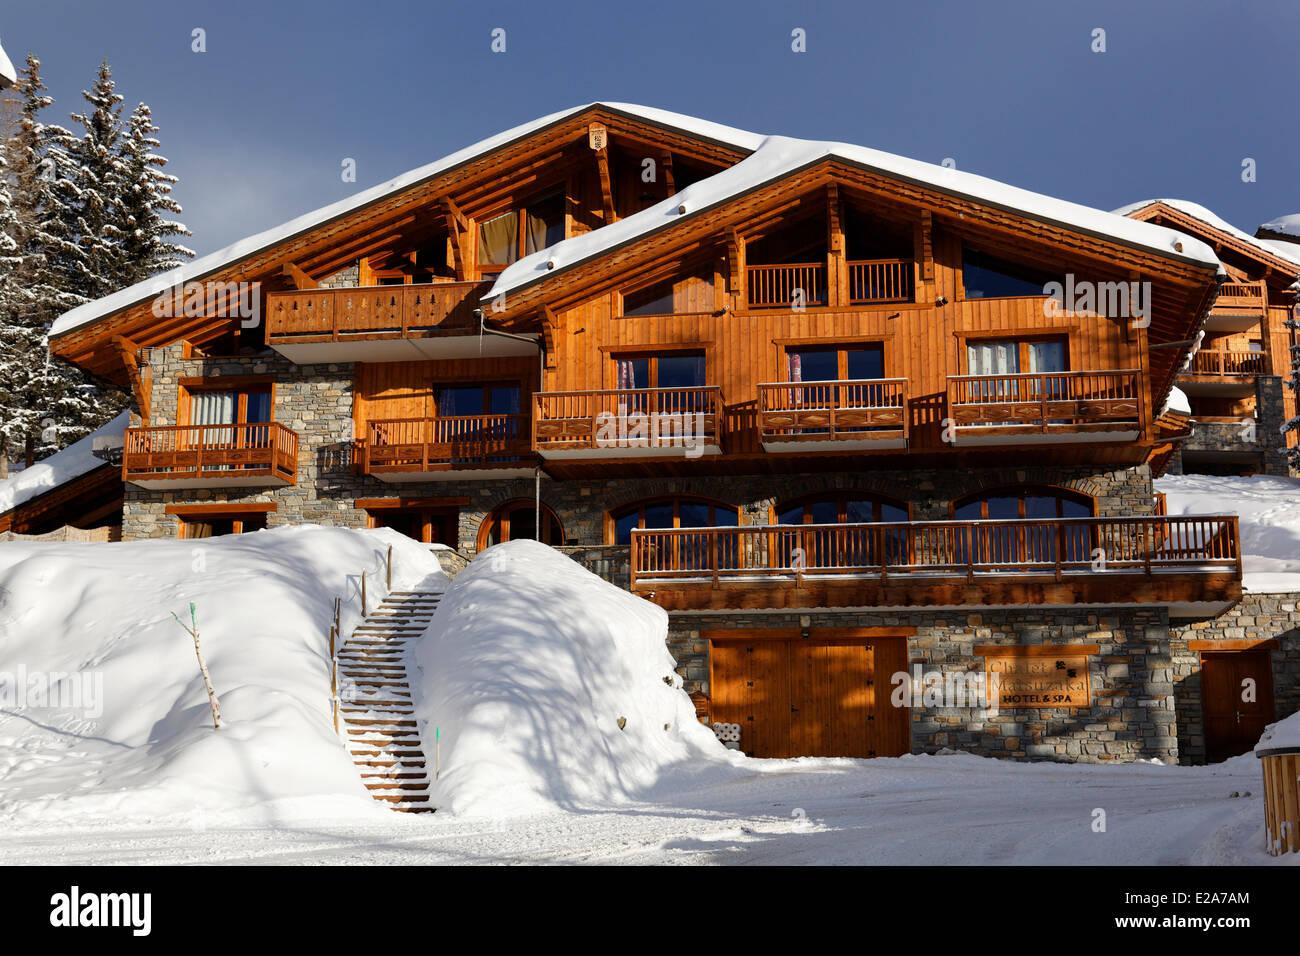 France Savoie La Rosiere The Chalet Matsuzaka Hotel Spa Bed